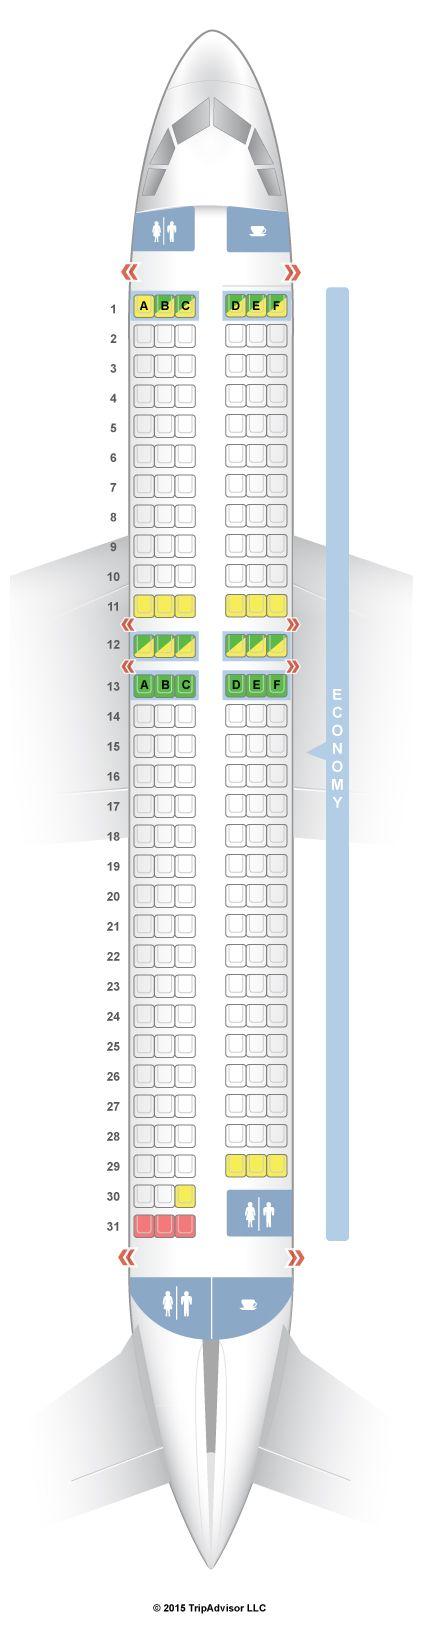 SeatGuru Seat Map easyJet Airbus A320 (320) V1 | Travel ... on boeing 777 seat map, virgin a340 seat map, a 320 seat map, airbus a319 seat map, airbus a380-800 seat map, airbus a330-200 seat map, delta airbus 333 seat map, virgin boeing 747-400 seat map, delta md-90 seat map, a320 jet seat map,